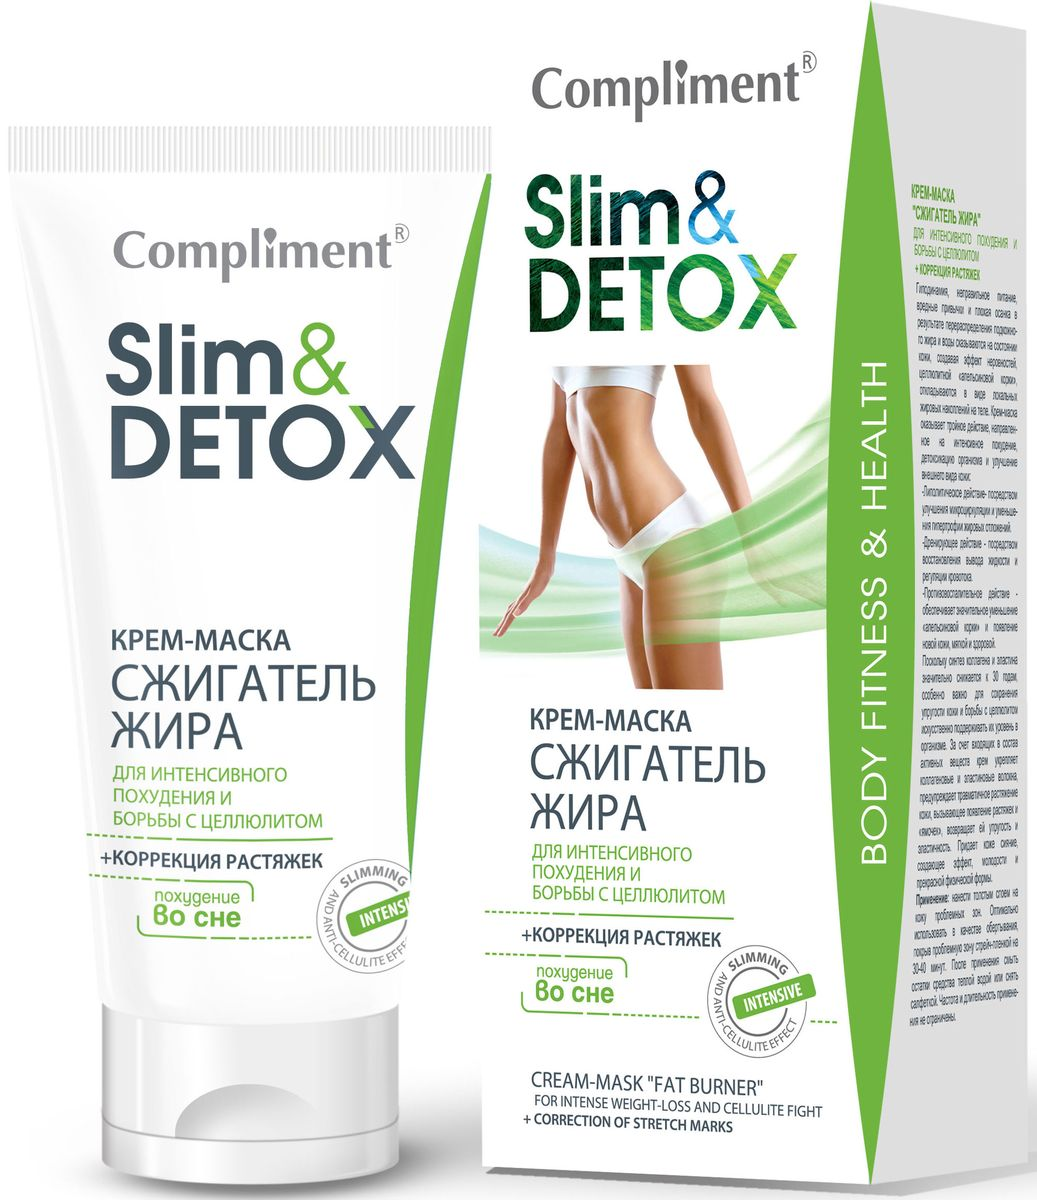 Compliment Slim&Detox Крем-маска